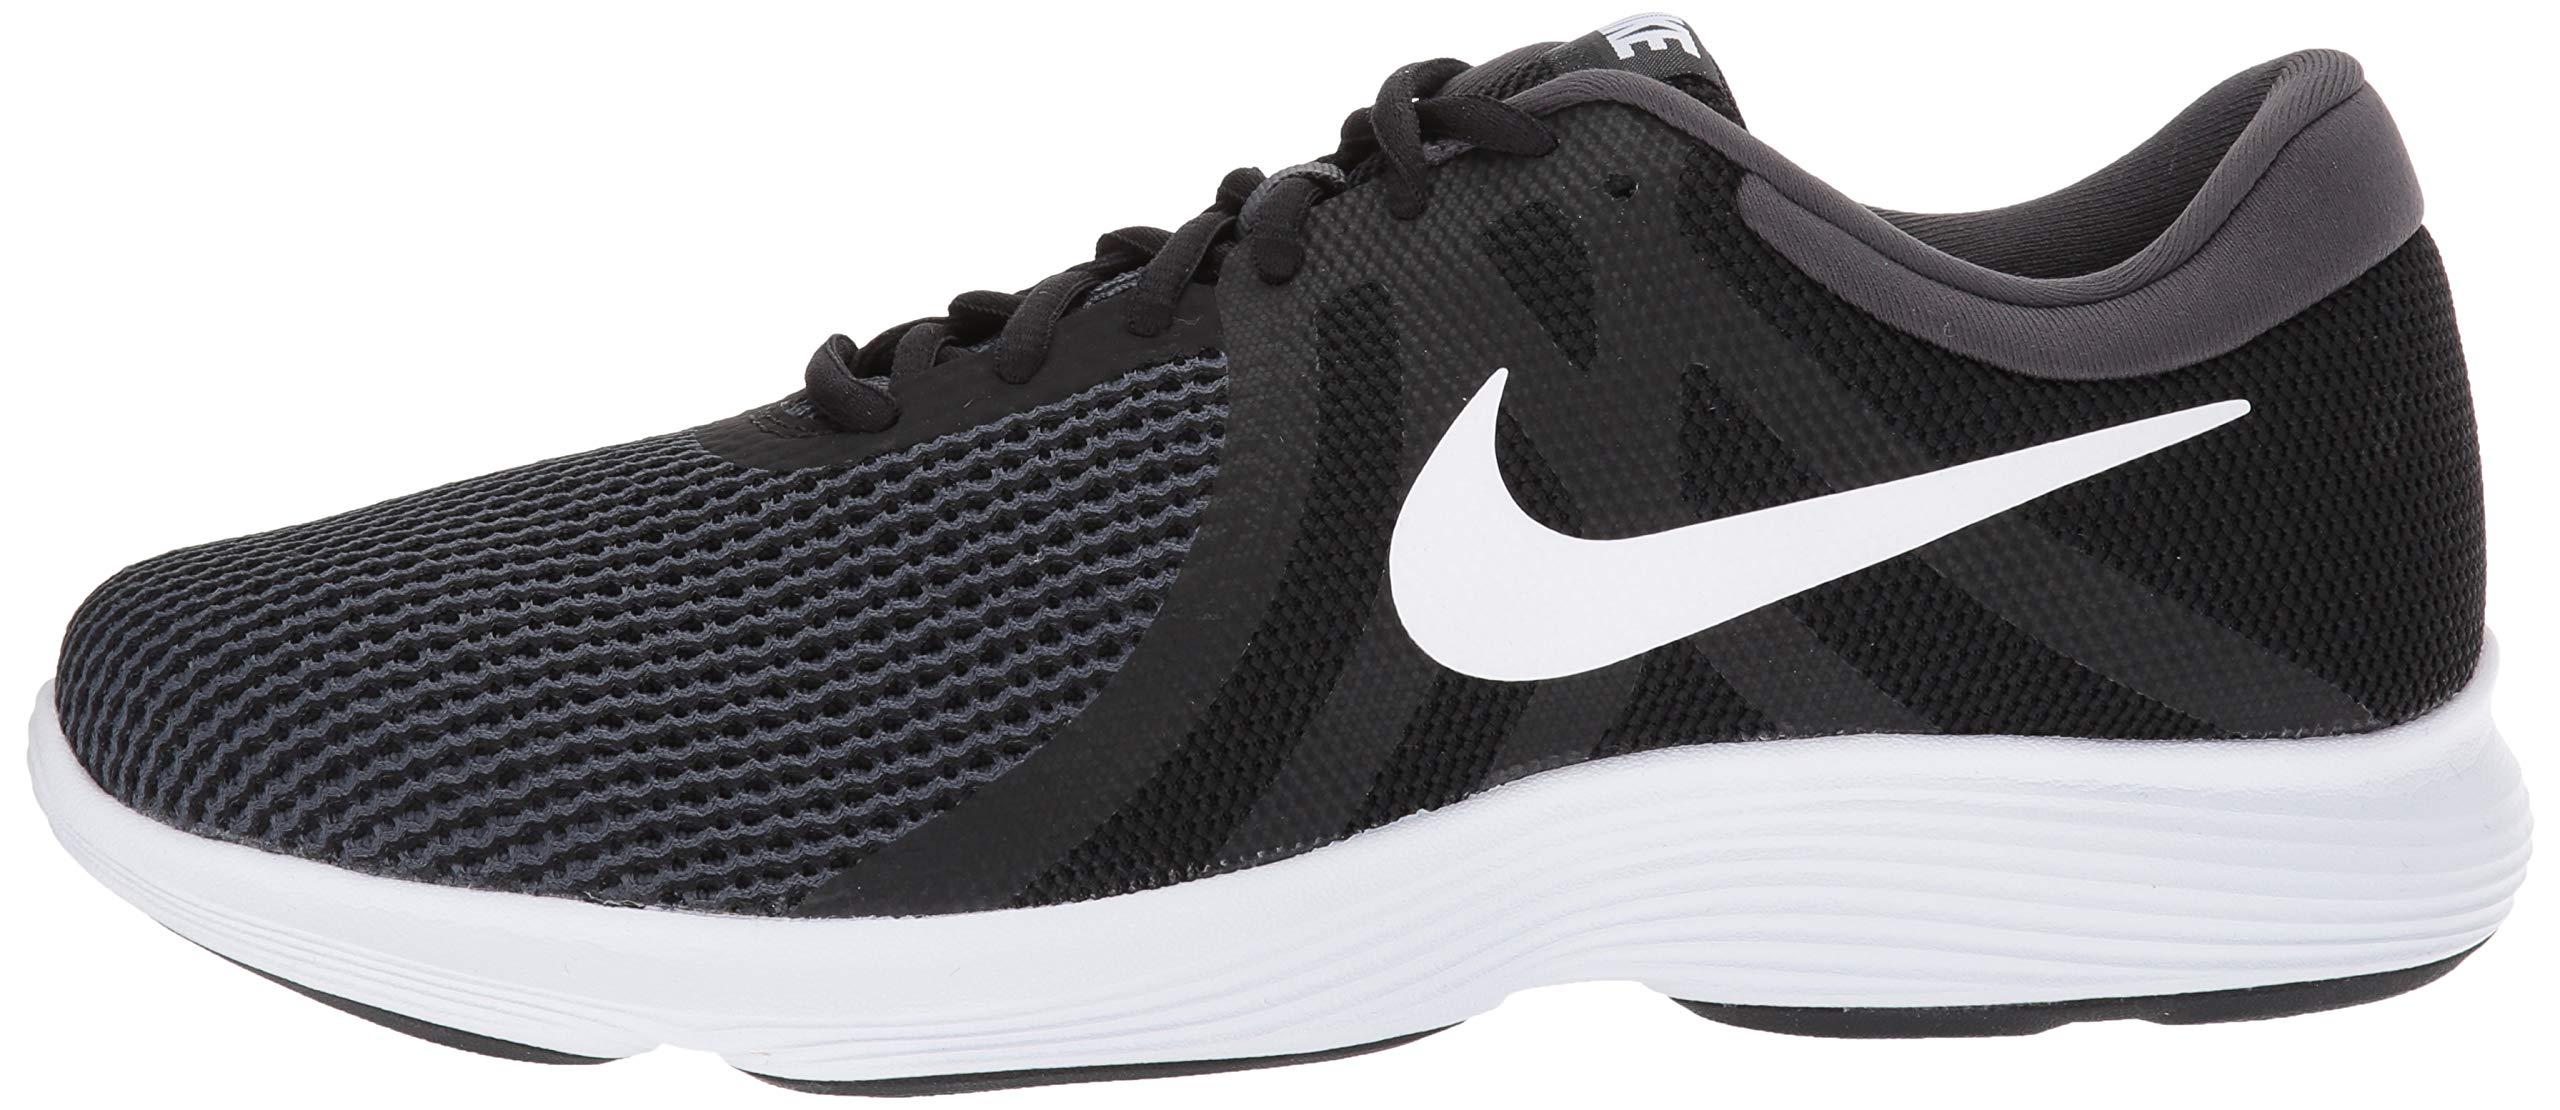 Nike Men's Revolution 4 Running Shoe Black/White - Anthracite 6.5 Wide US by Nike (Image #5)